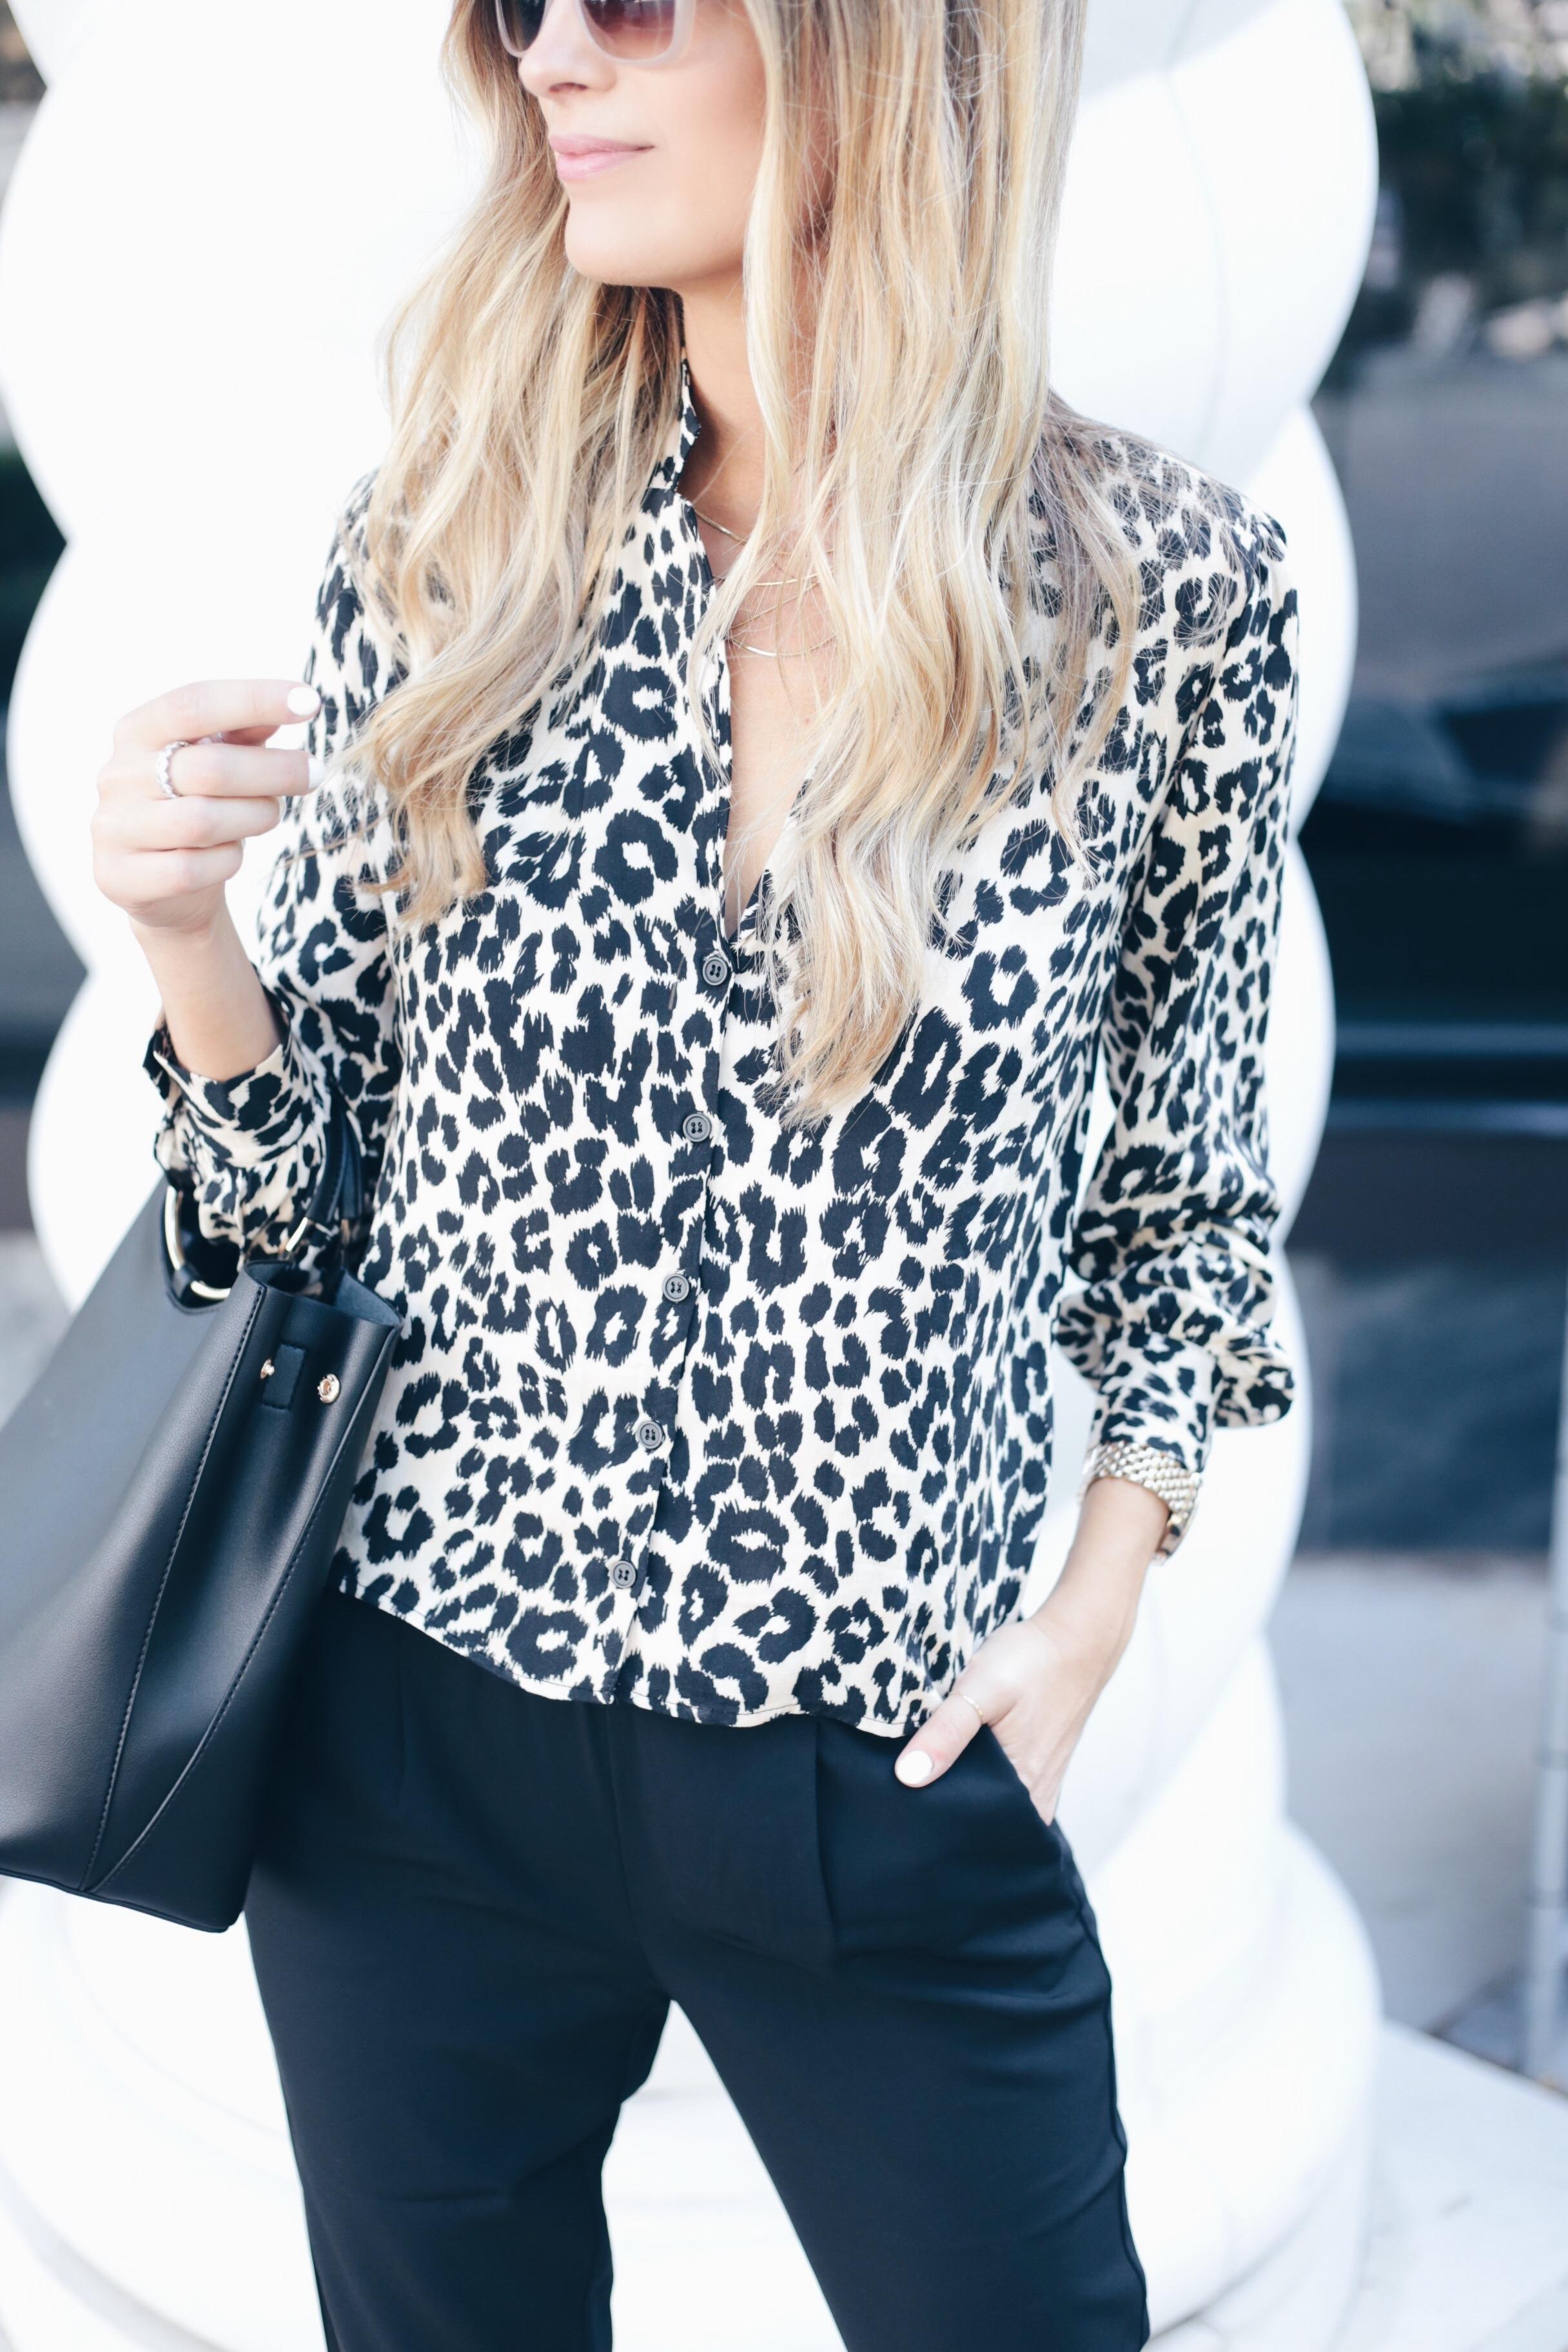 Fall fashion trends 2018 - leopard print top on Connecticut fashion blog Pinteresting Plans